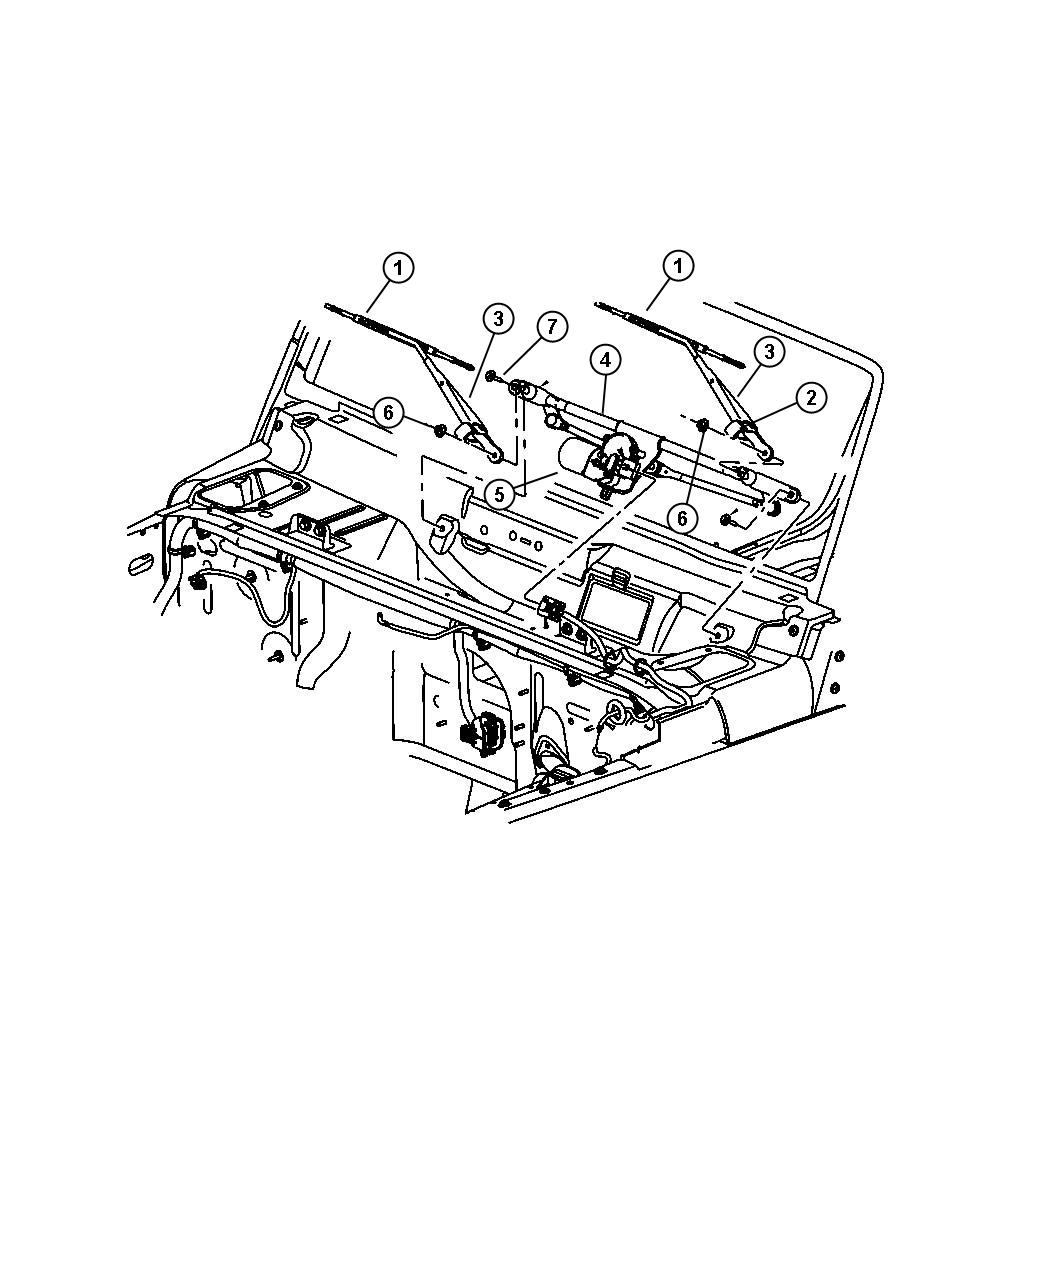 Jeep Wrangler Engine Diagram